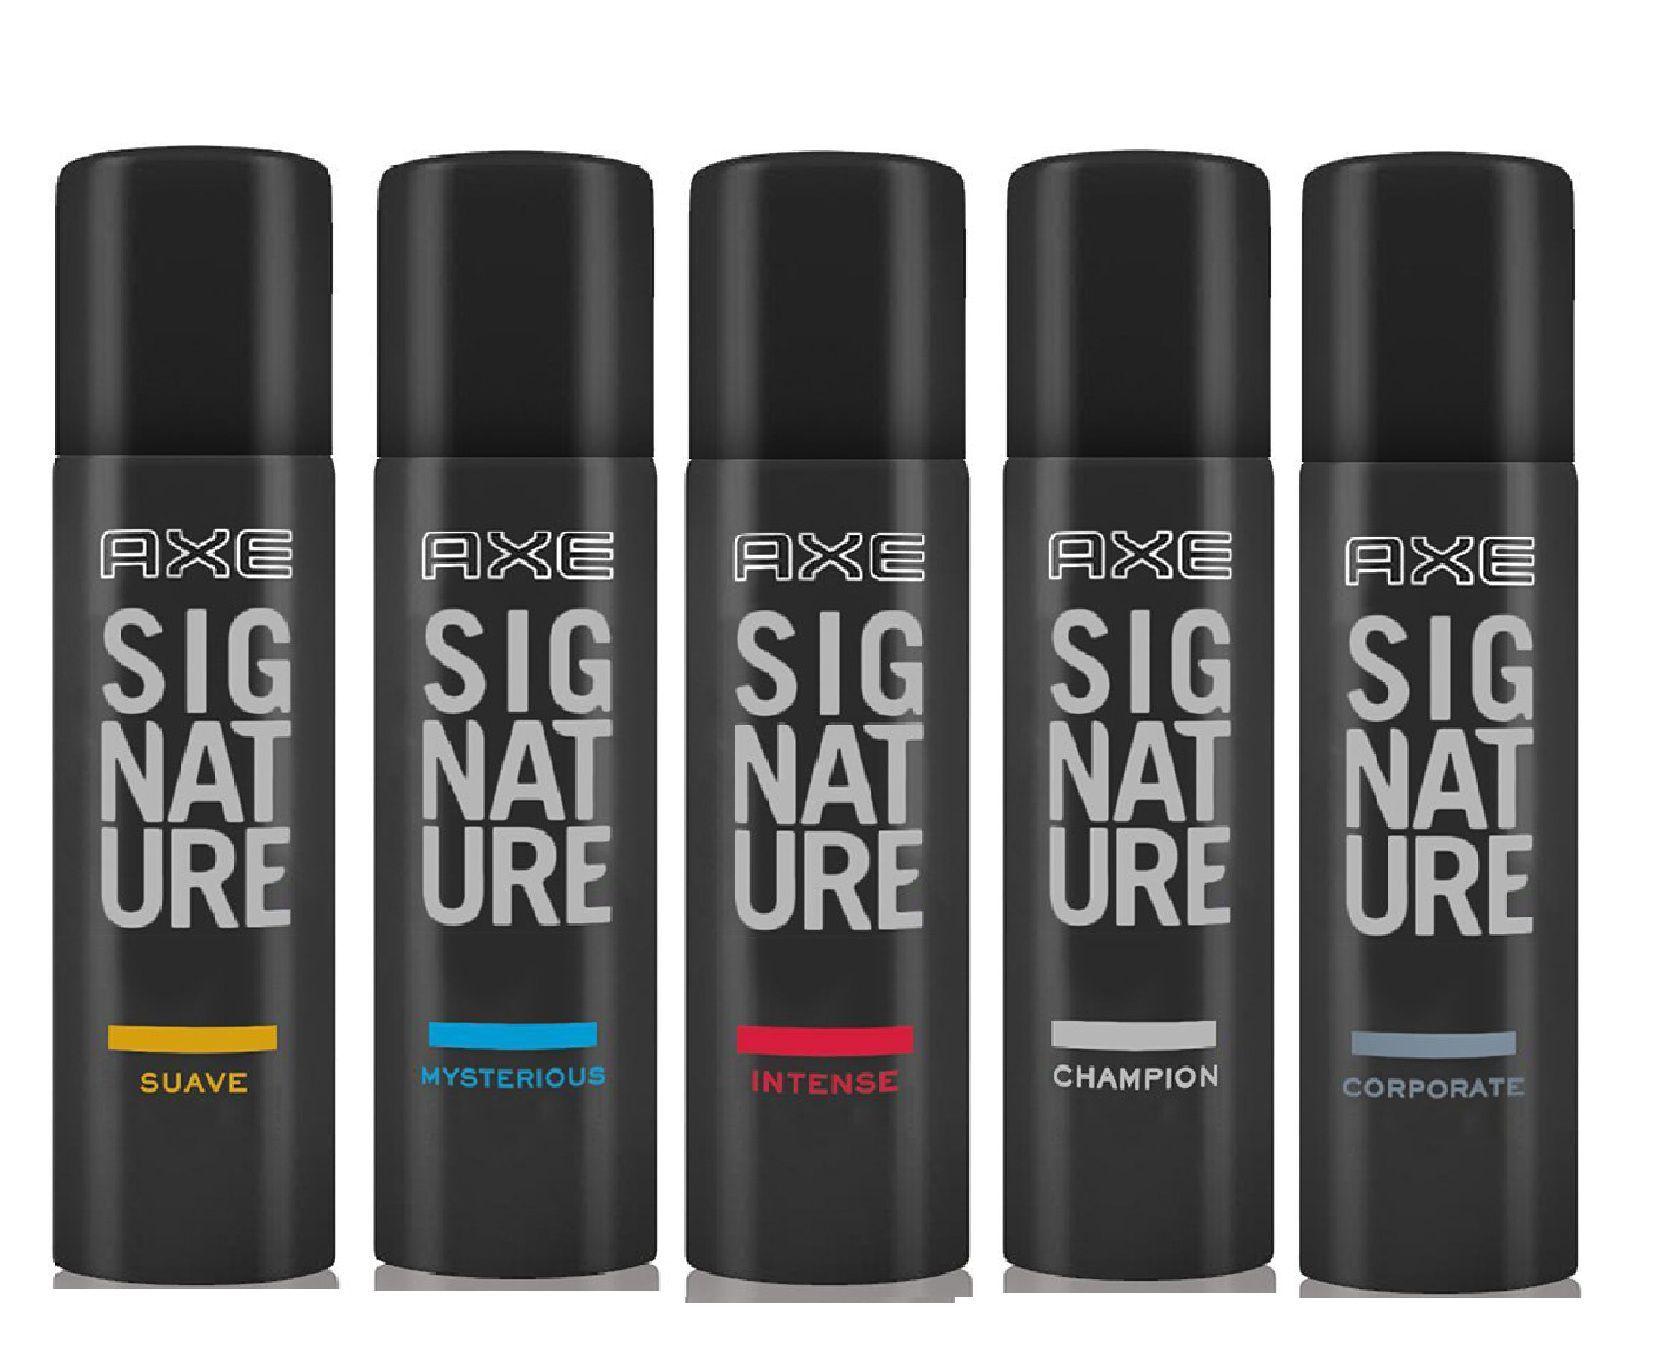 Axe Signature Body Perfume Suave Mysterious Intense Champion